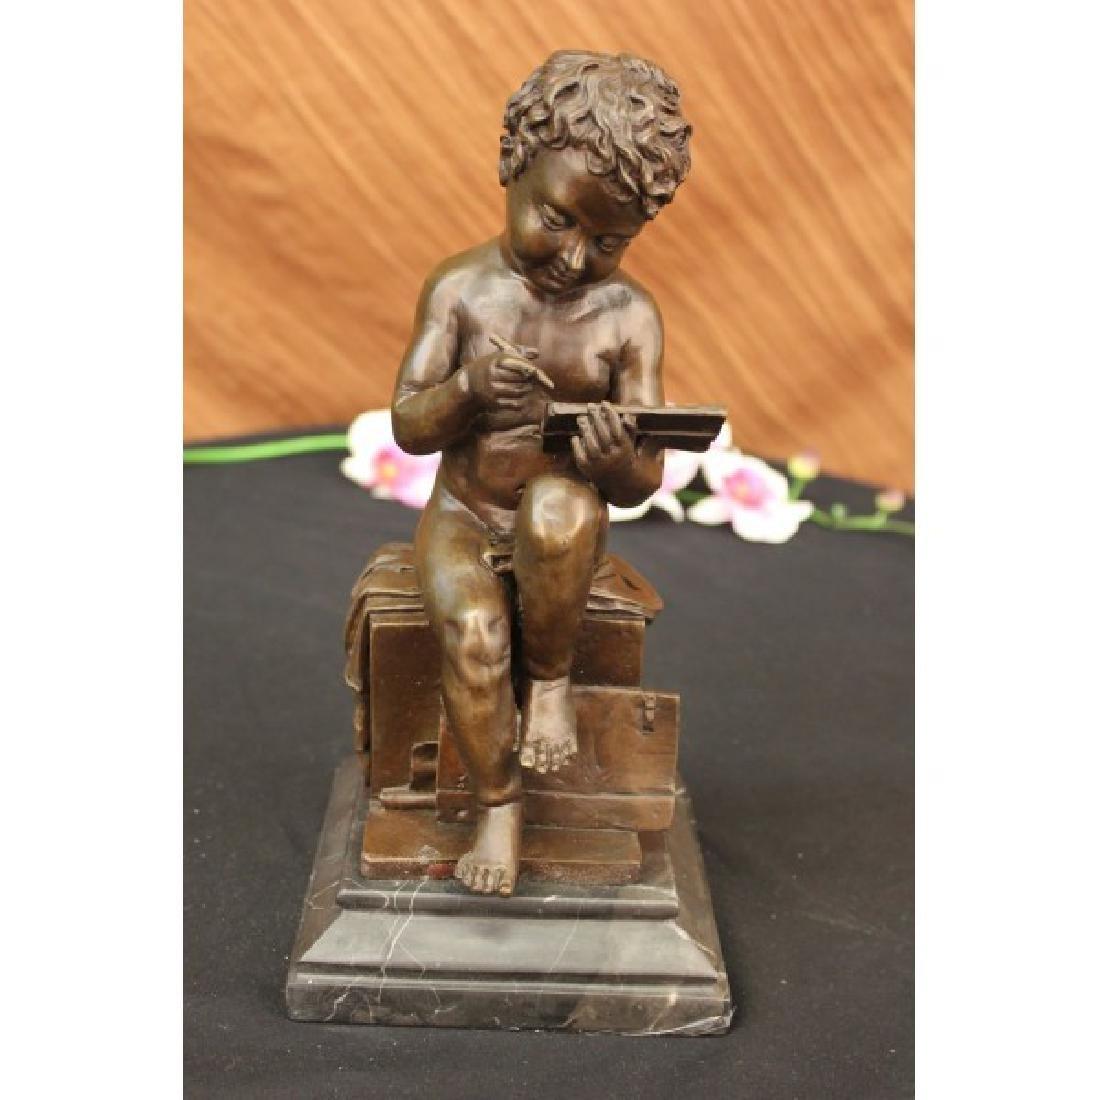 Art Taylor Cute Nude Boy acting Bronze Sculpture